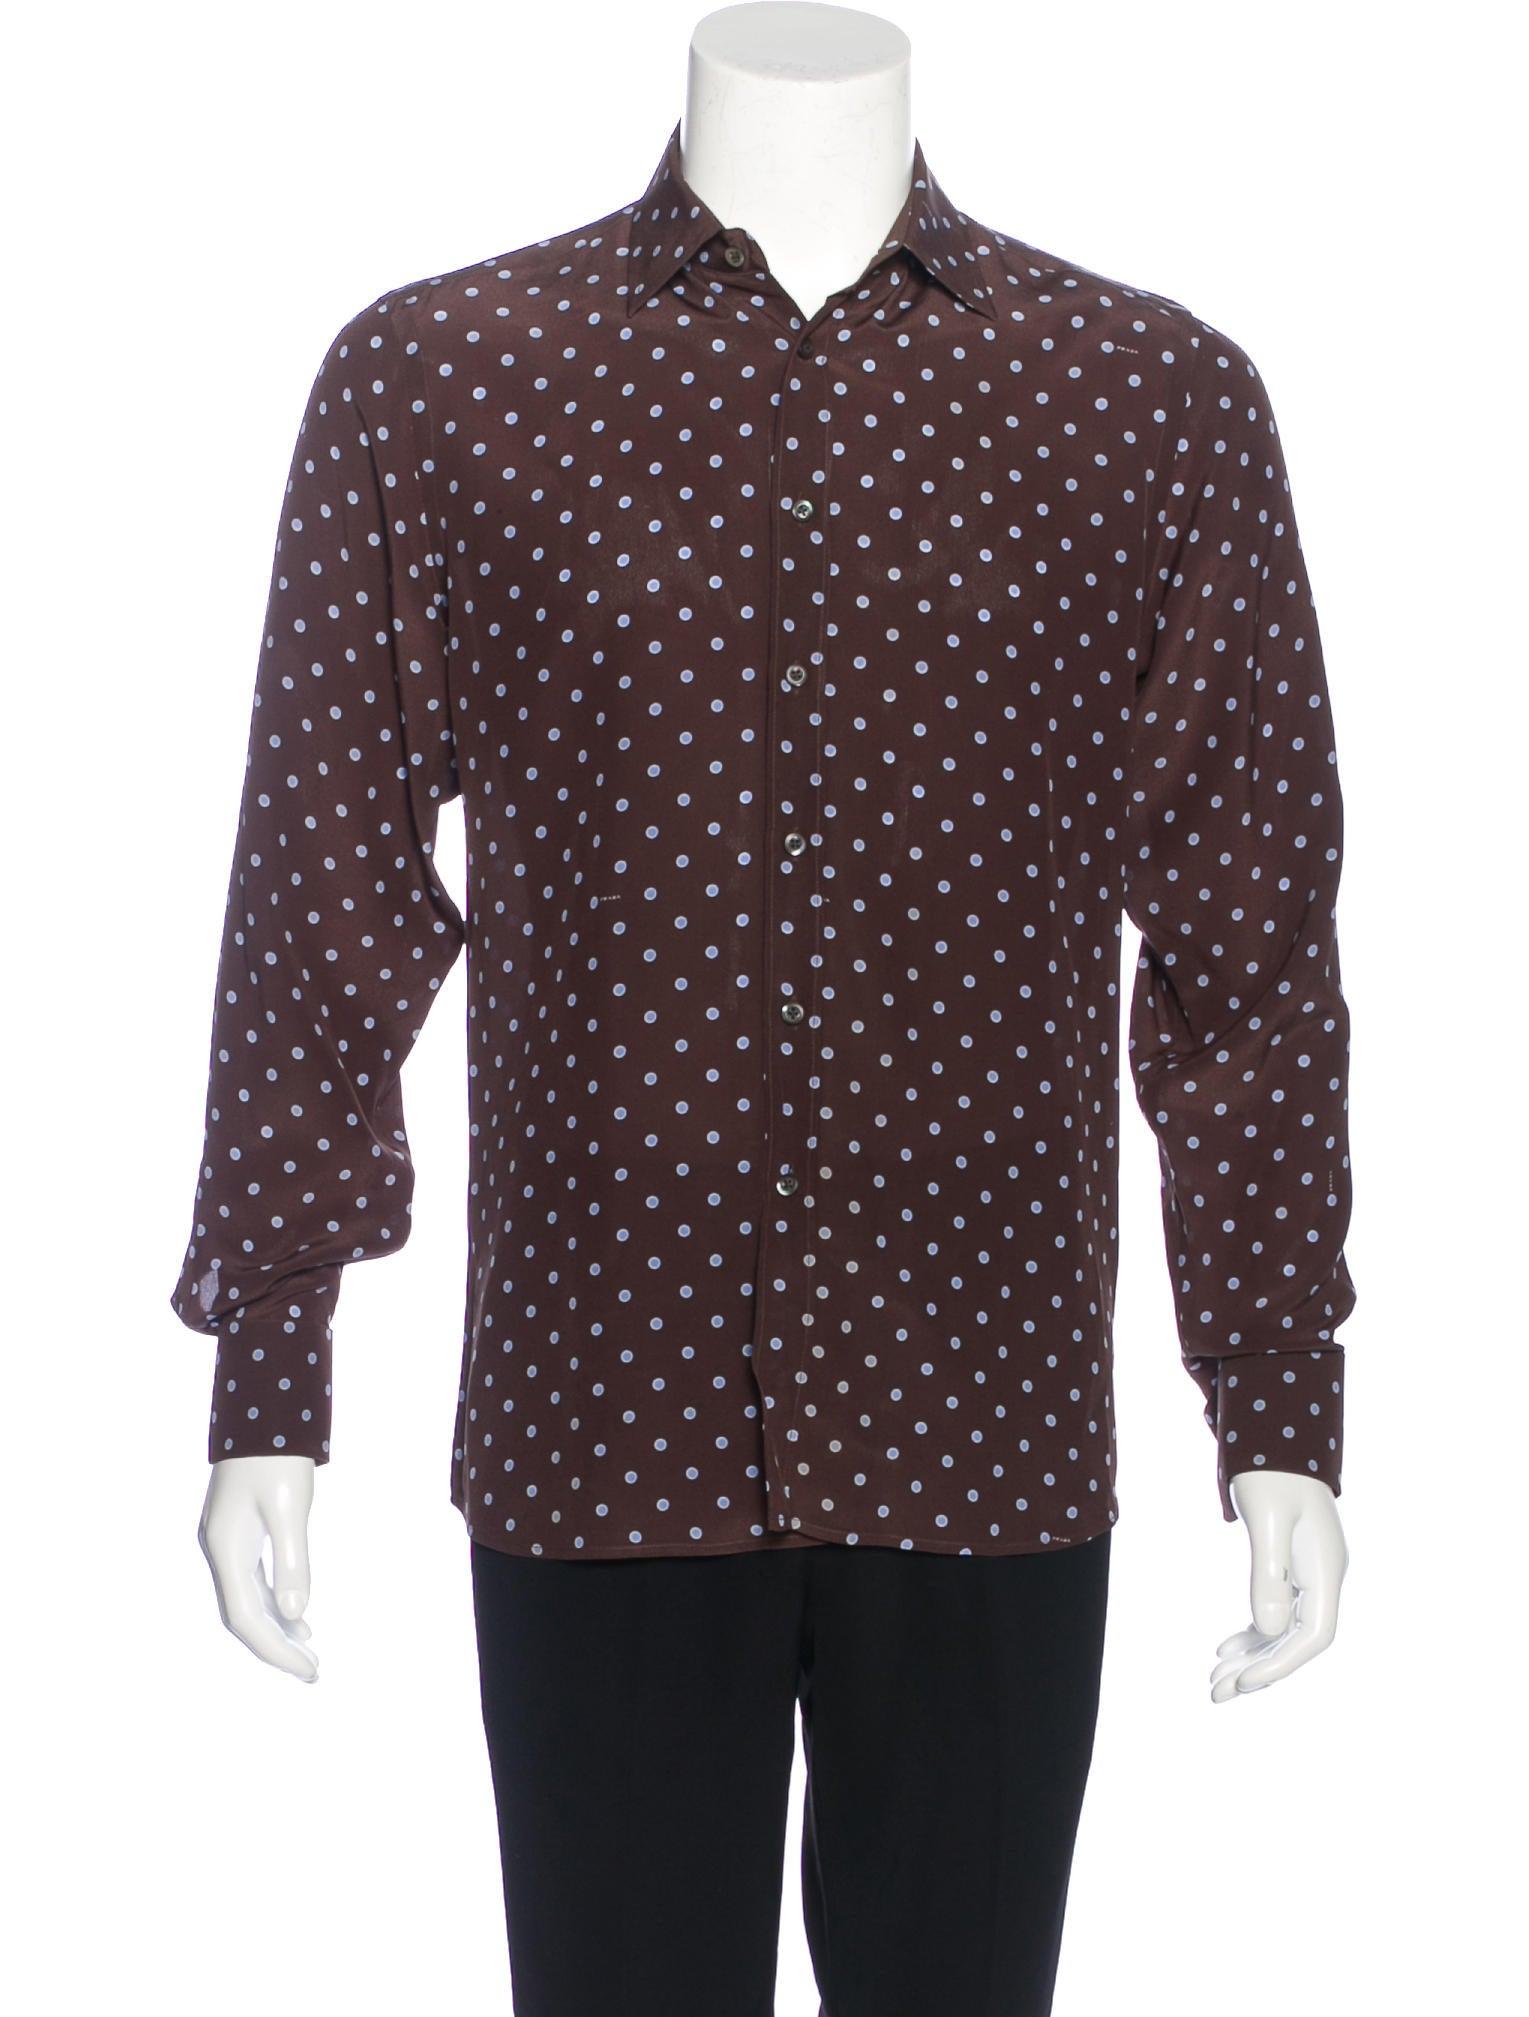 Prada silk french cuff shirt clothing pra155897 the for French cuff dress shirts for sale